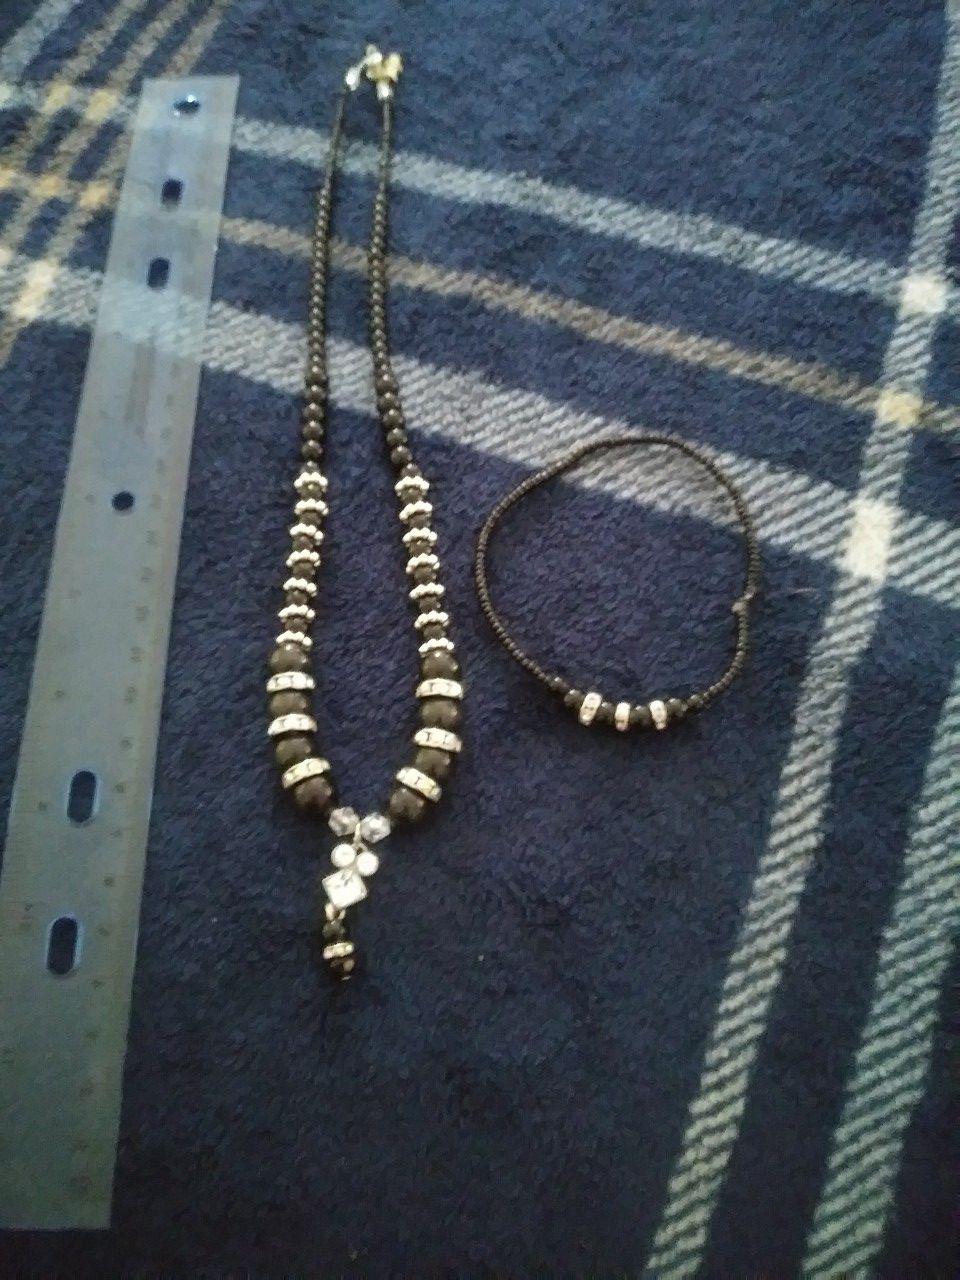 Custom jewlery bracelet and necklace